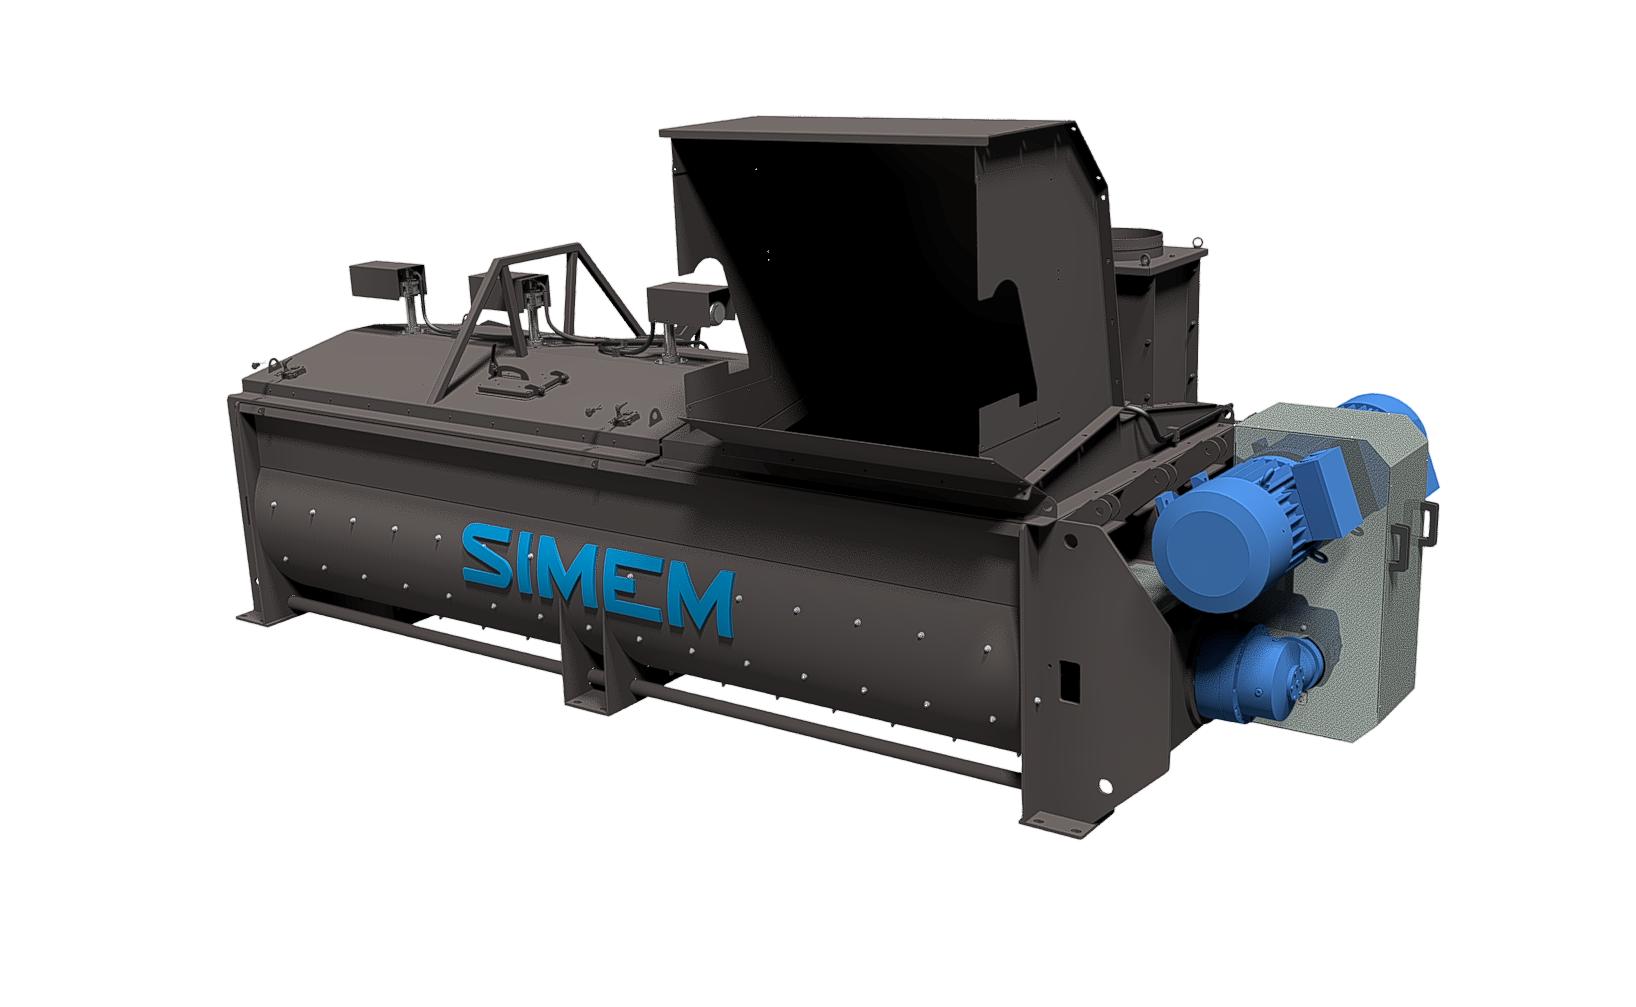 Simem ReMDC twin shaft mixer